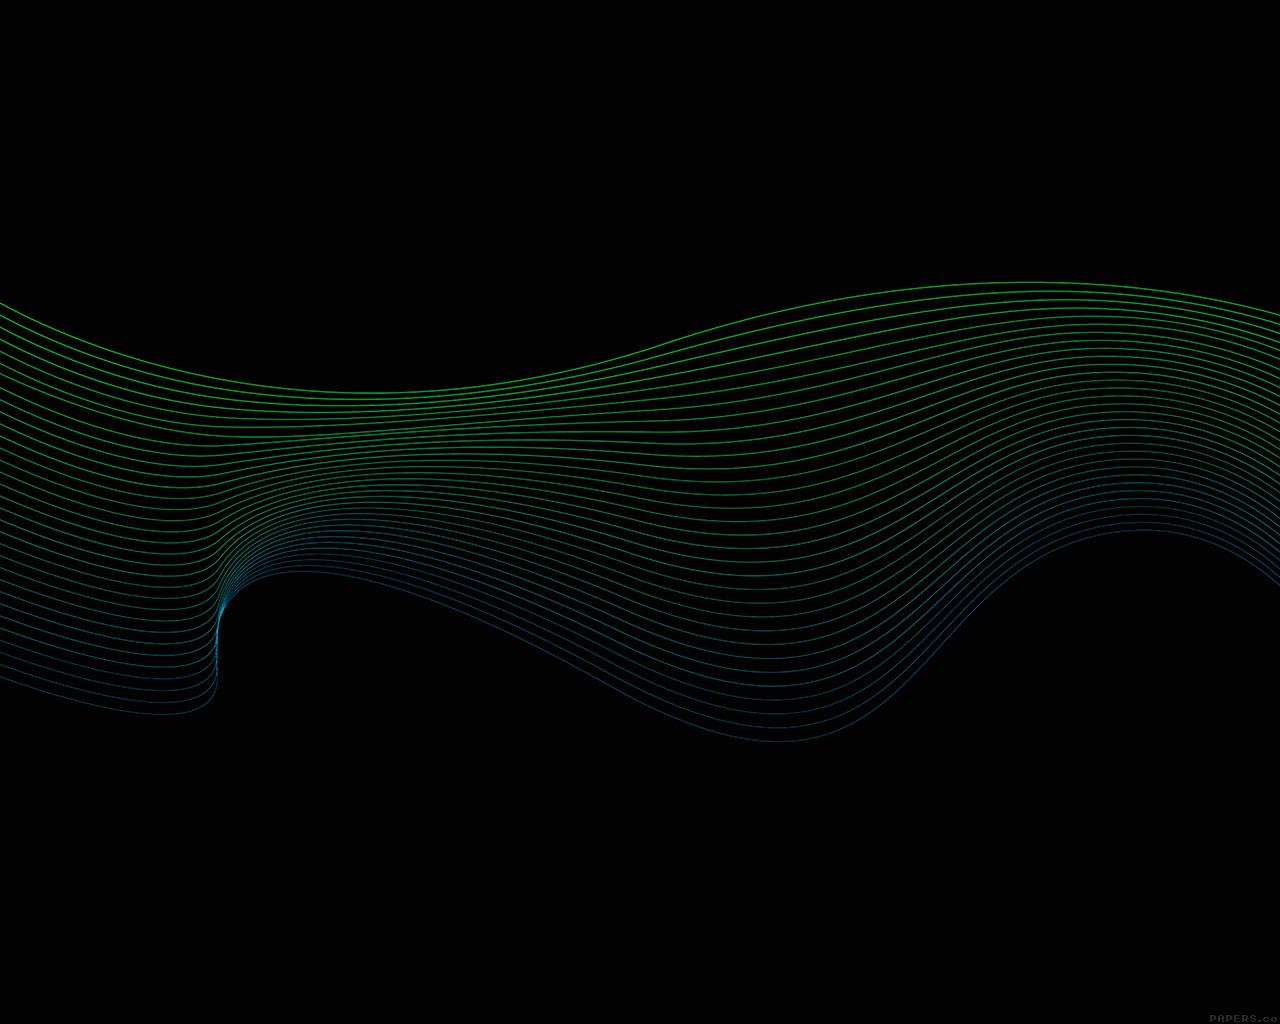 Iphone Fall Wallpaper Vf40 Digital Noise Graphic Dark Art Pattern Wallpaper